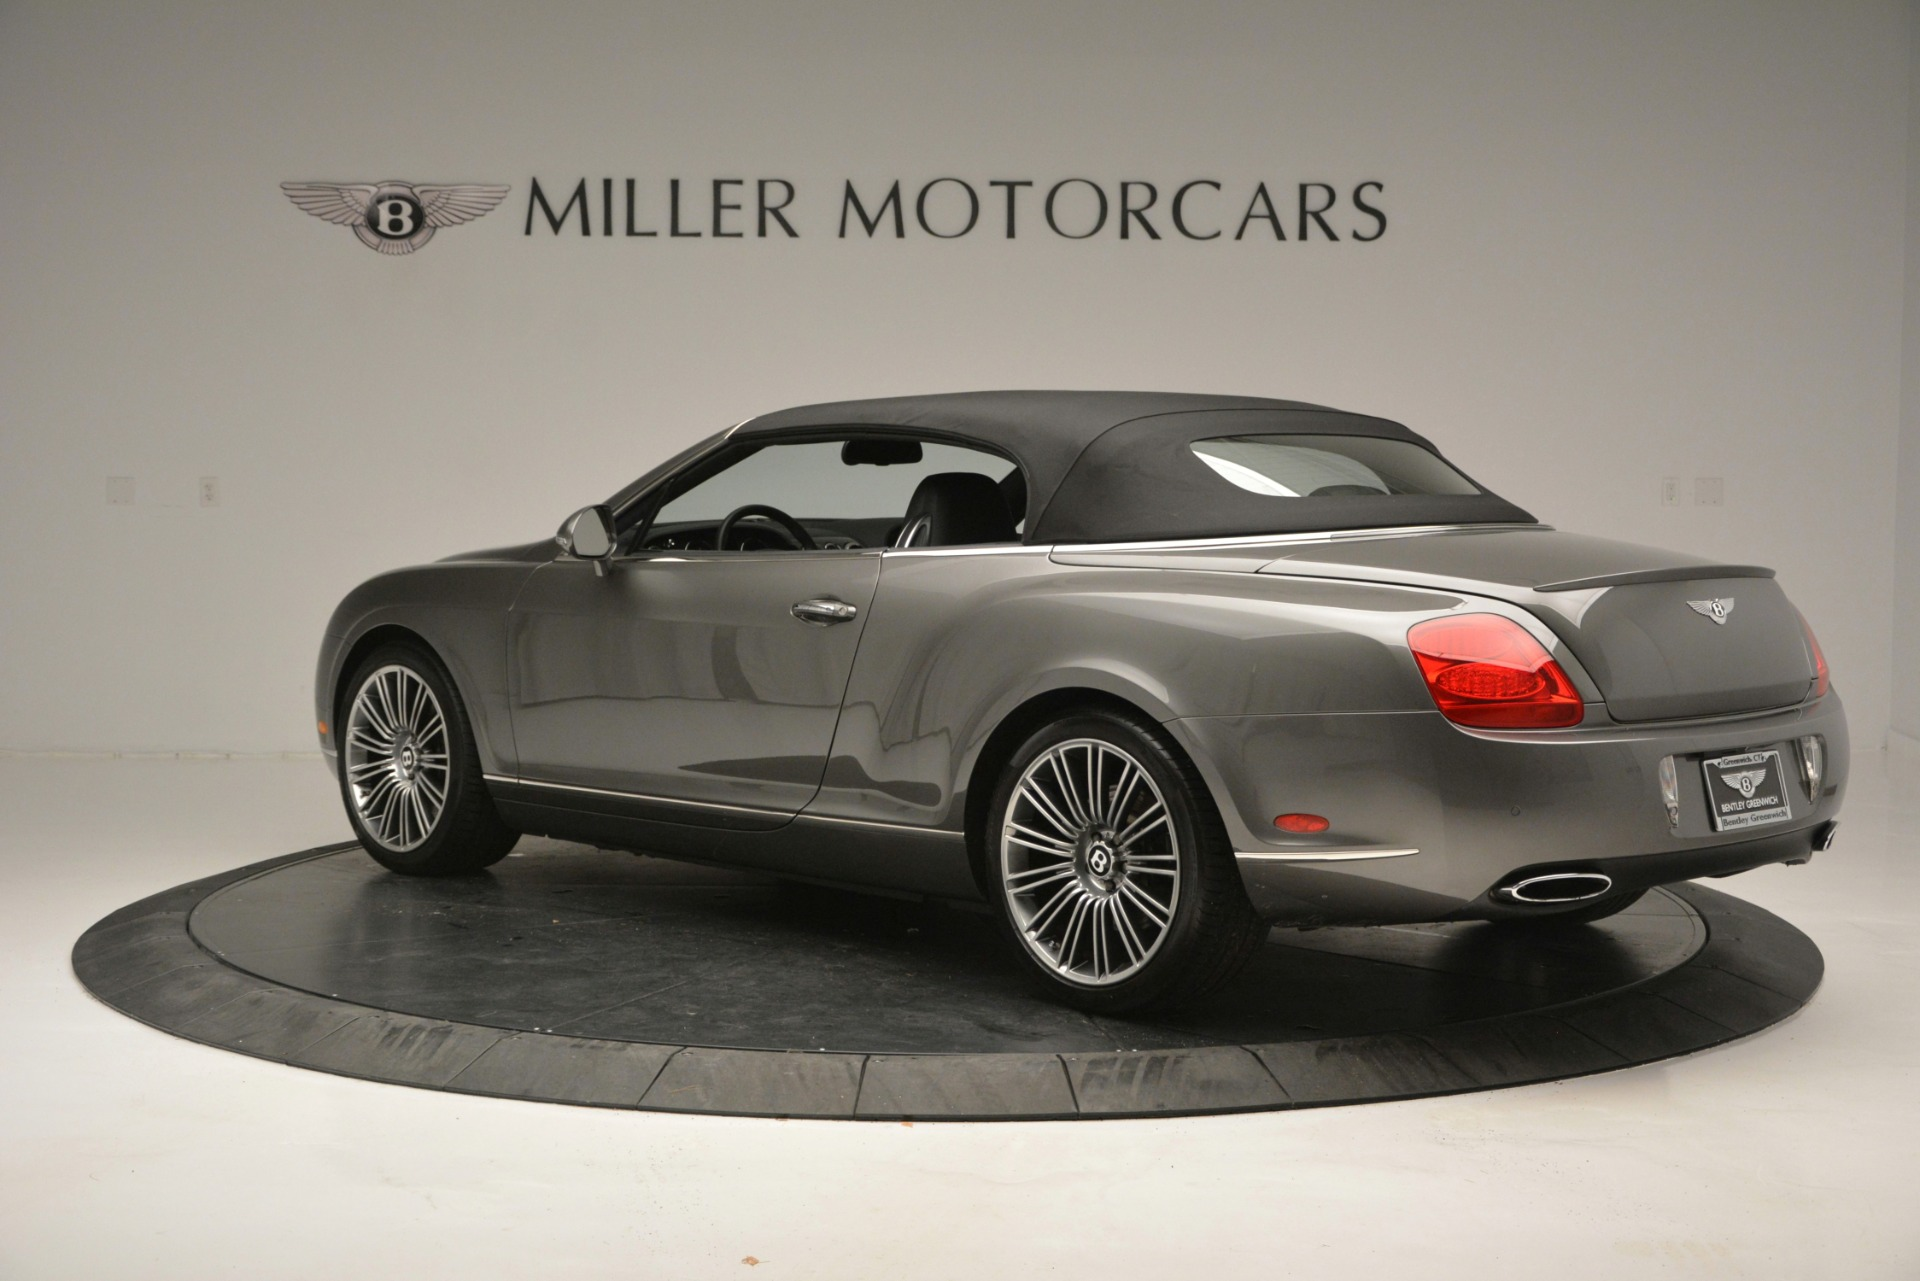 Used 2010 Bentley Continental GT Speed For Sale In Westport, CT 2677_p13